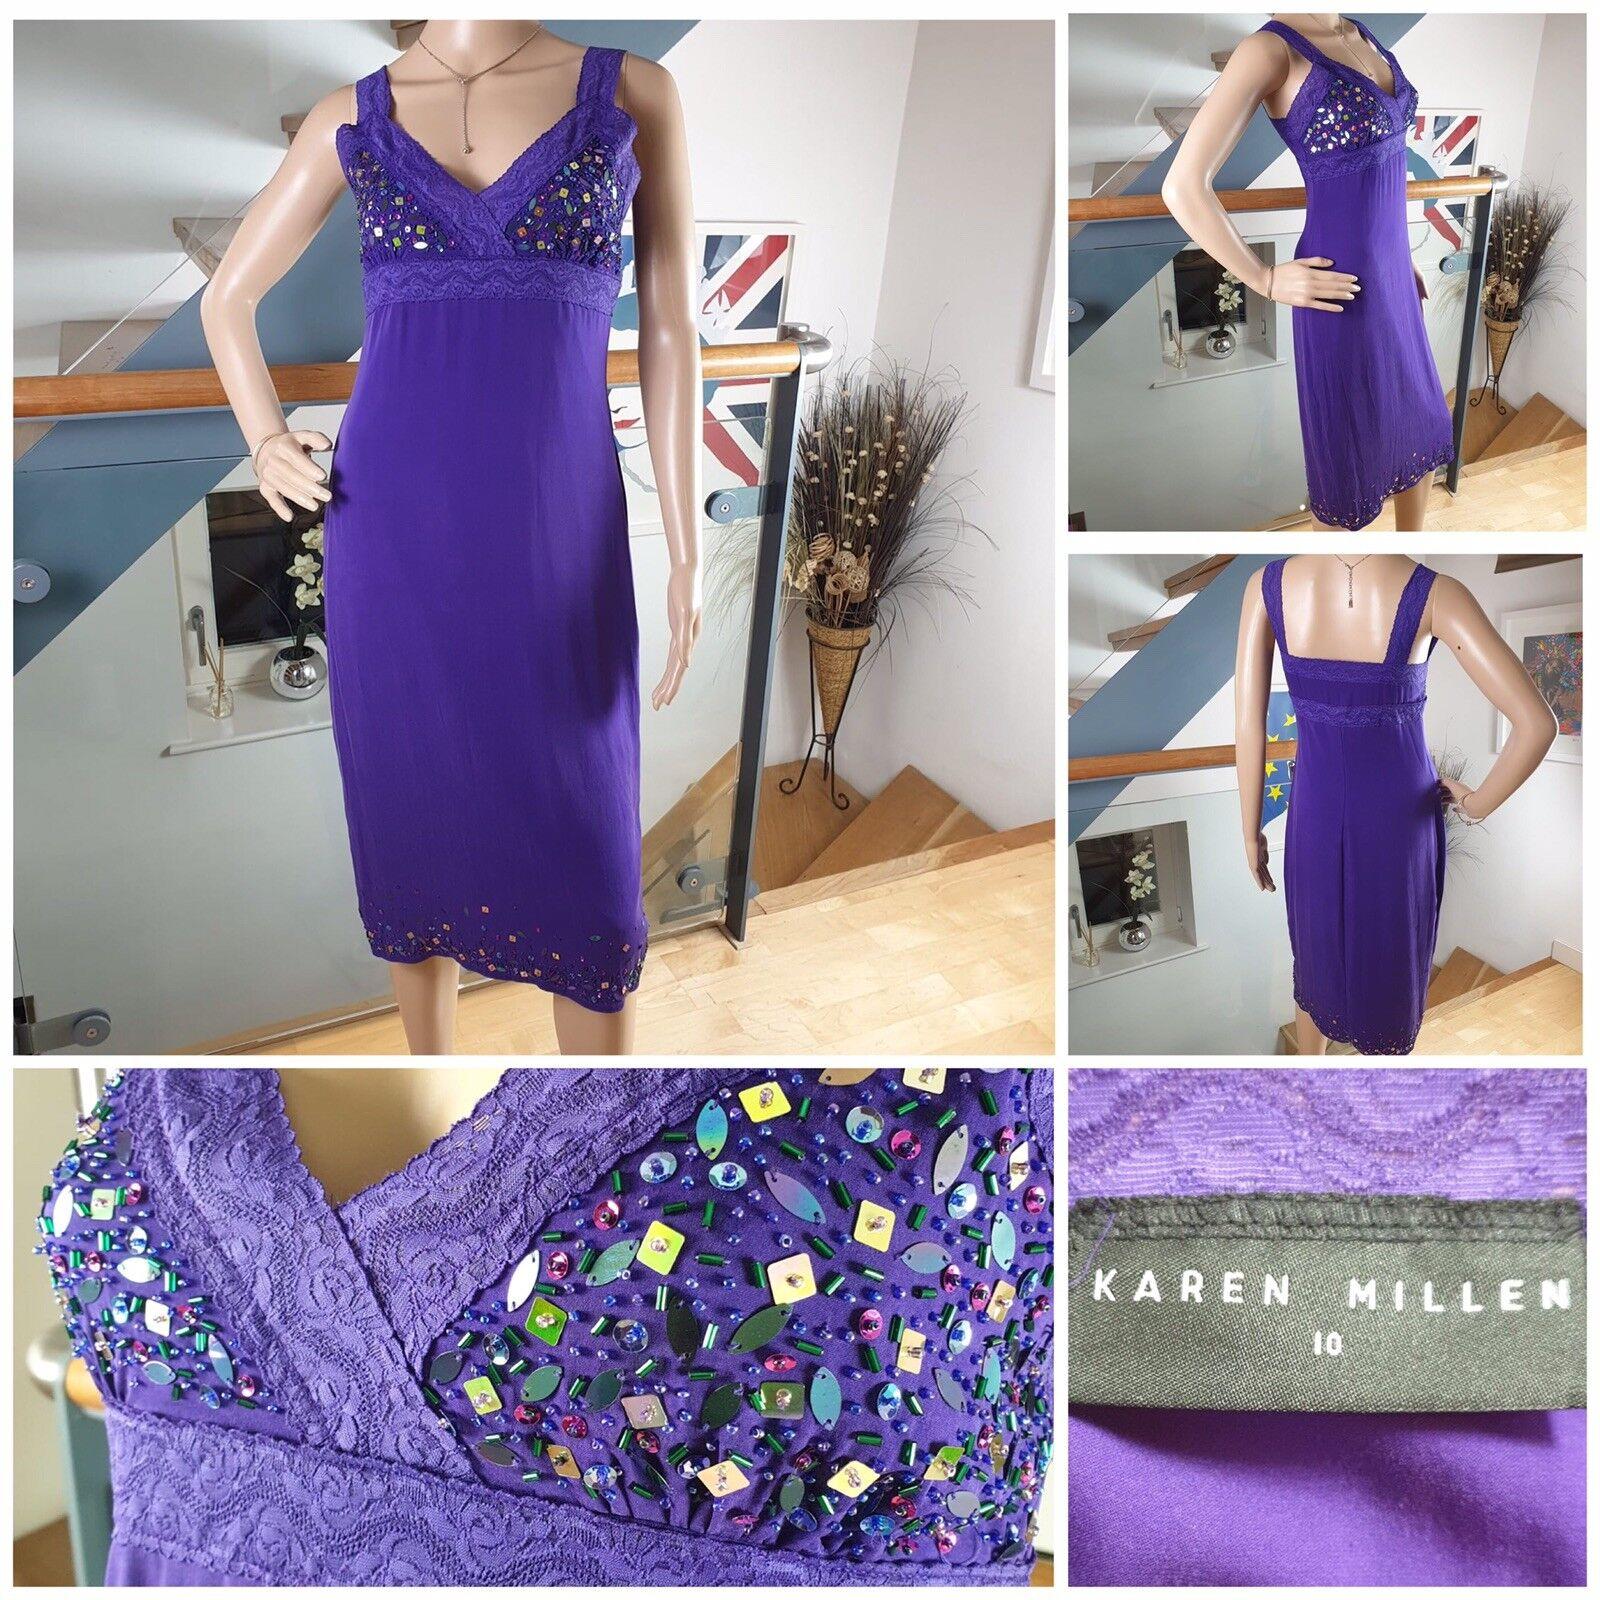 Karen Millen Purple Silk Slip Dress Stretch Sequin Embellished Size 10